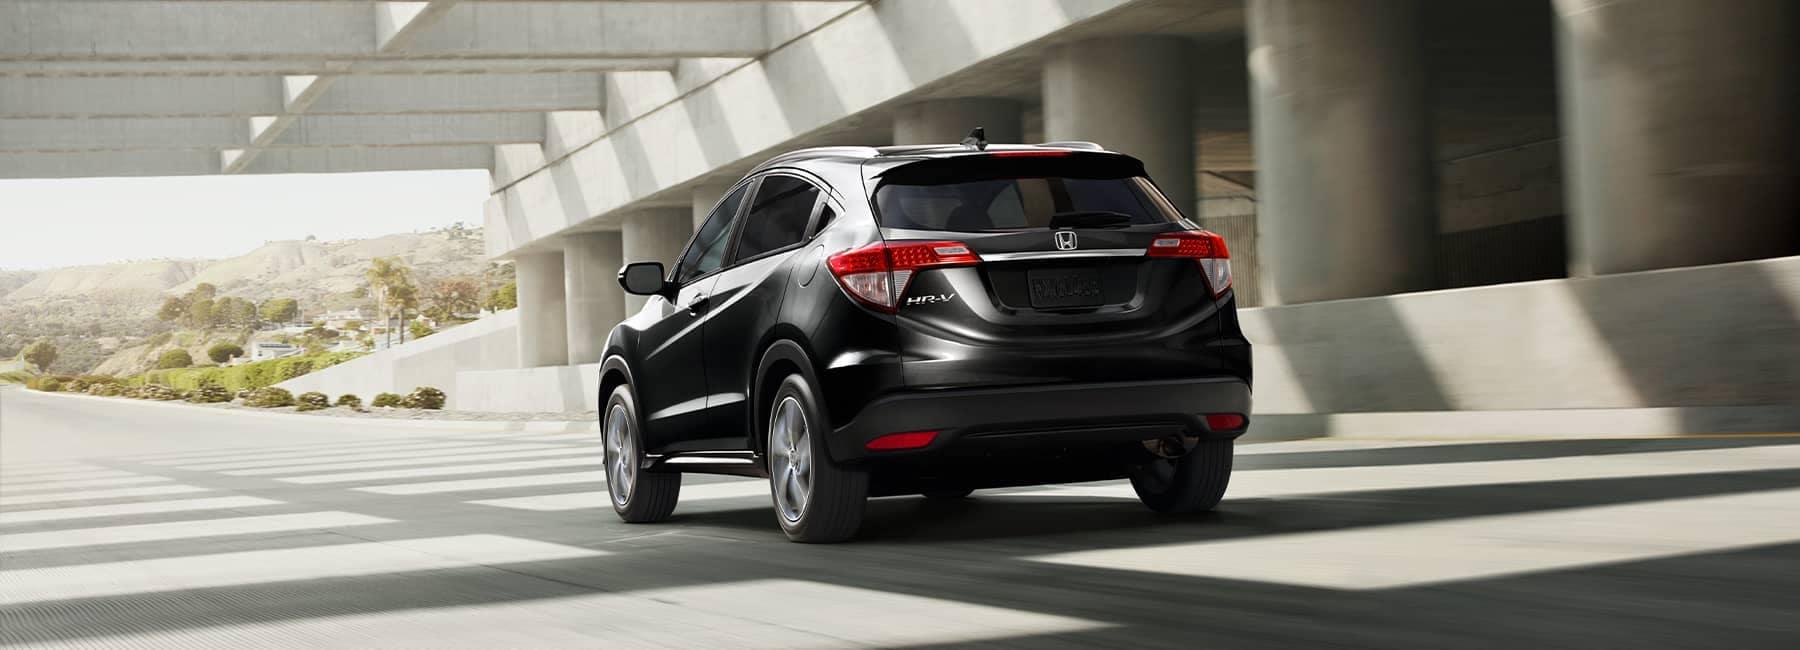 2021 Black Honda HR-V driving under a highway overpass